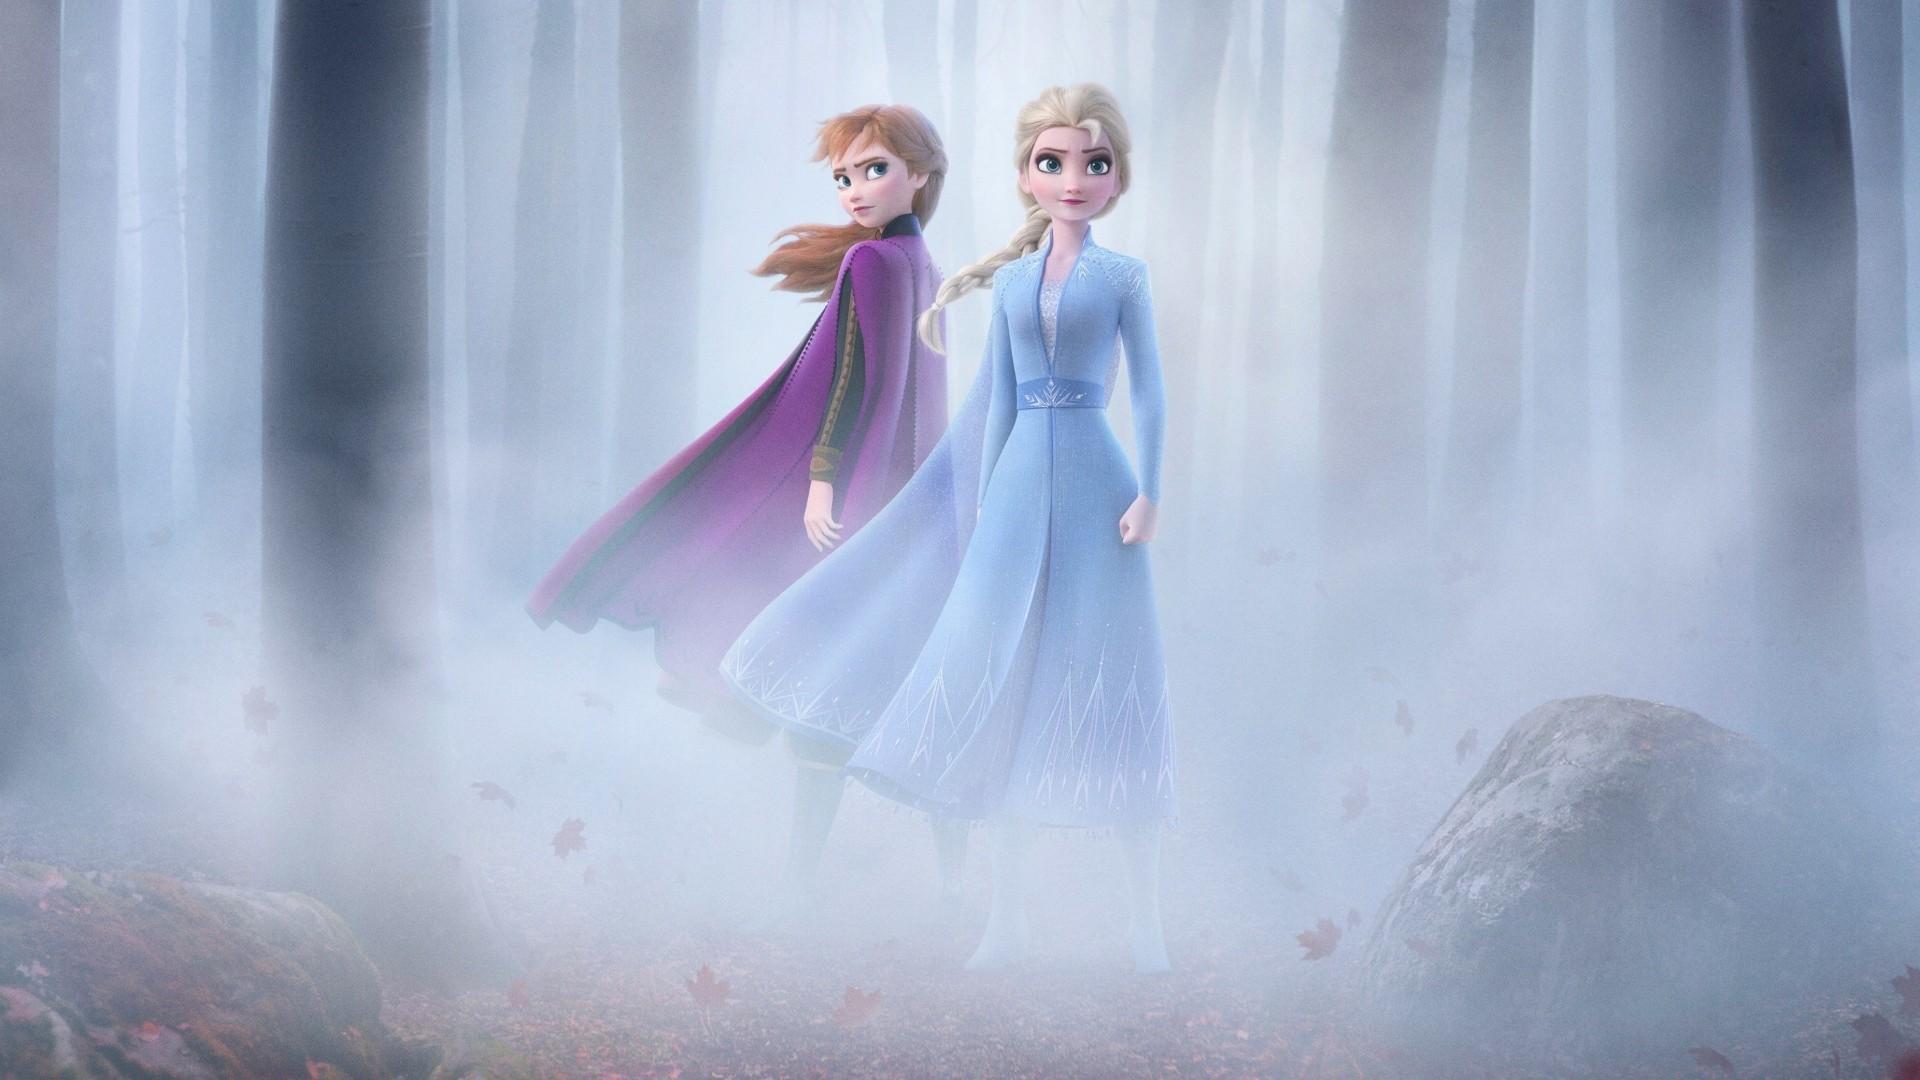 Frozen 2 Background Wallpaper